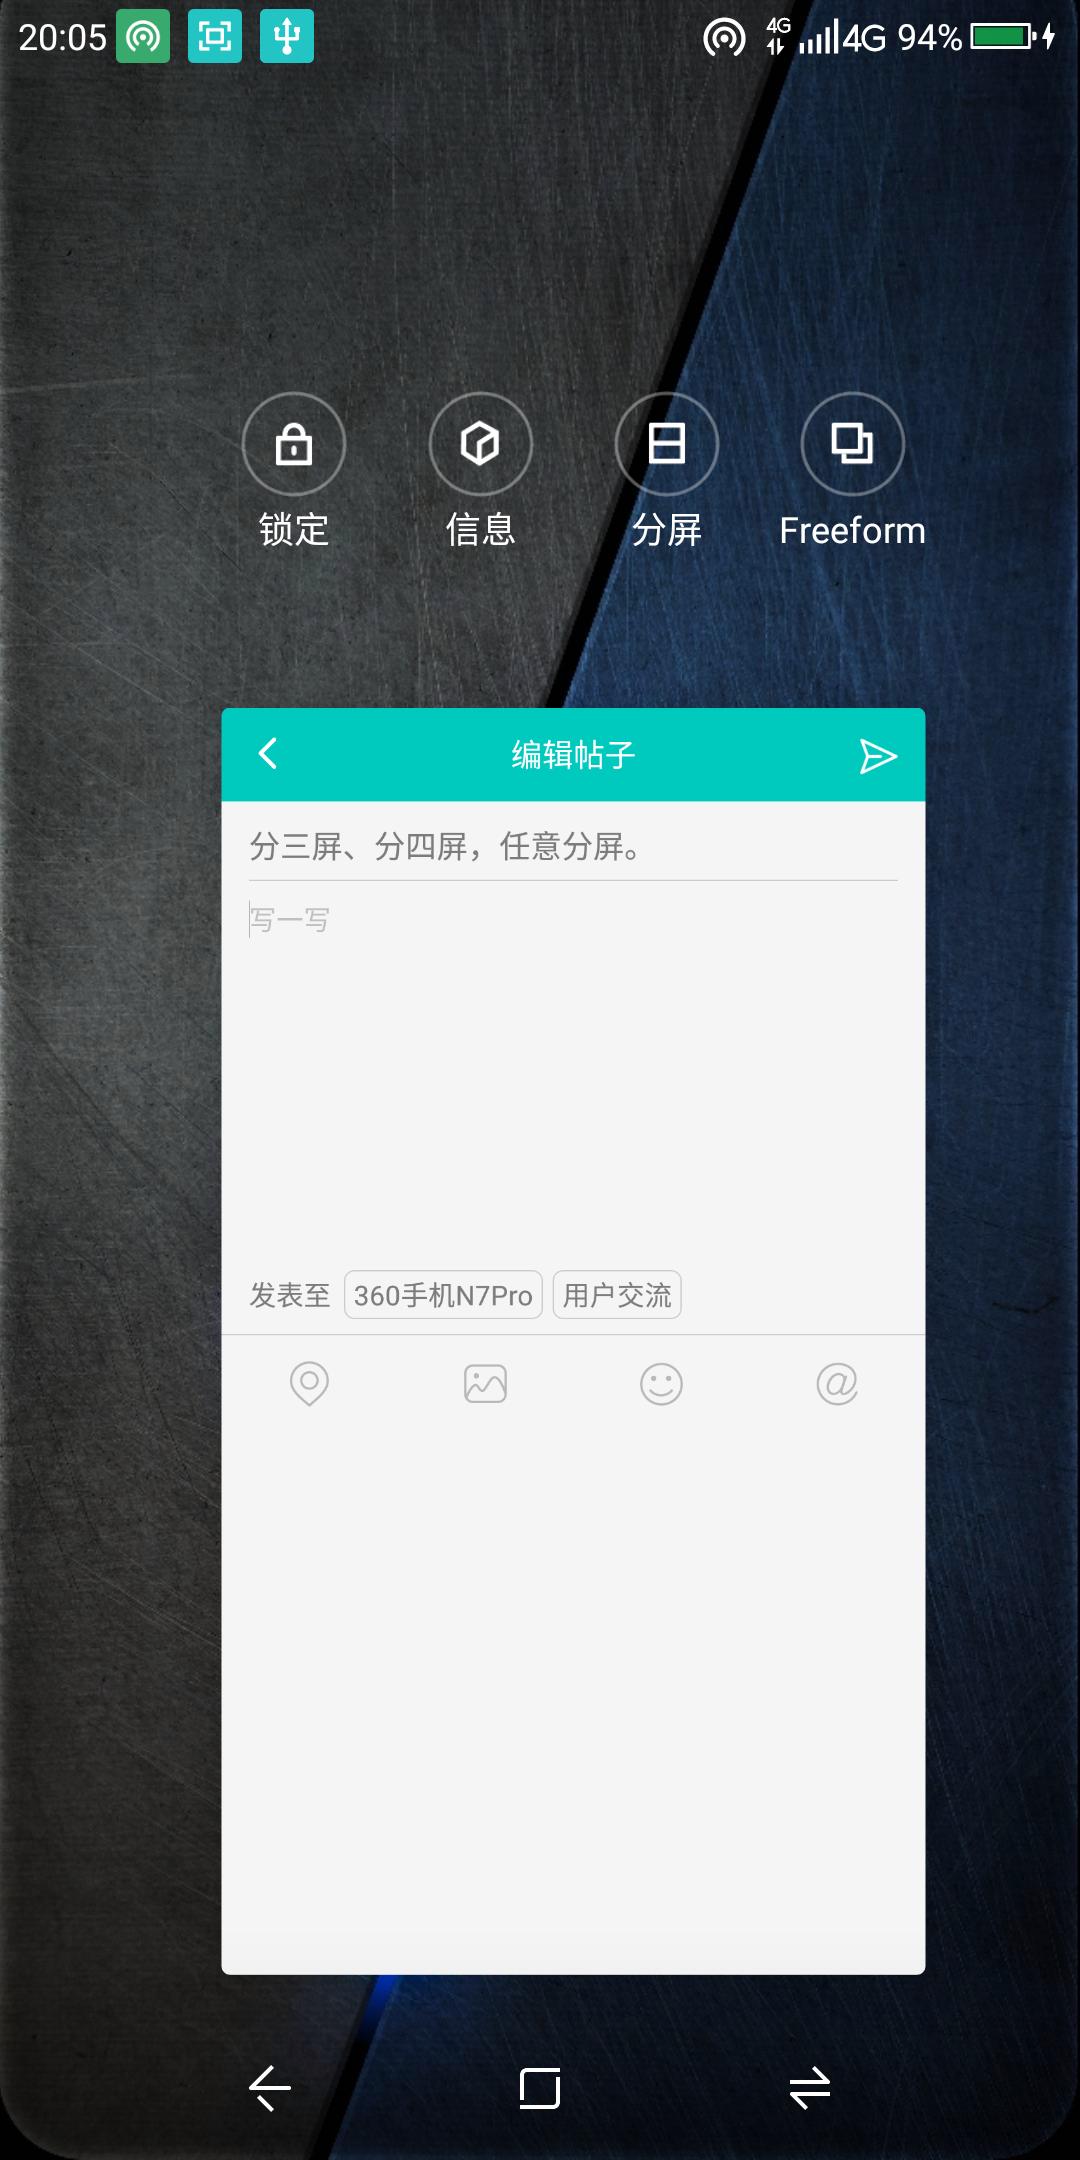 Screenshot_2019-03-09-20-05-53.png